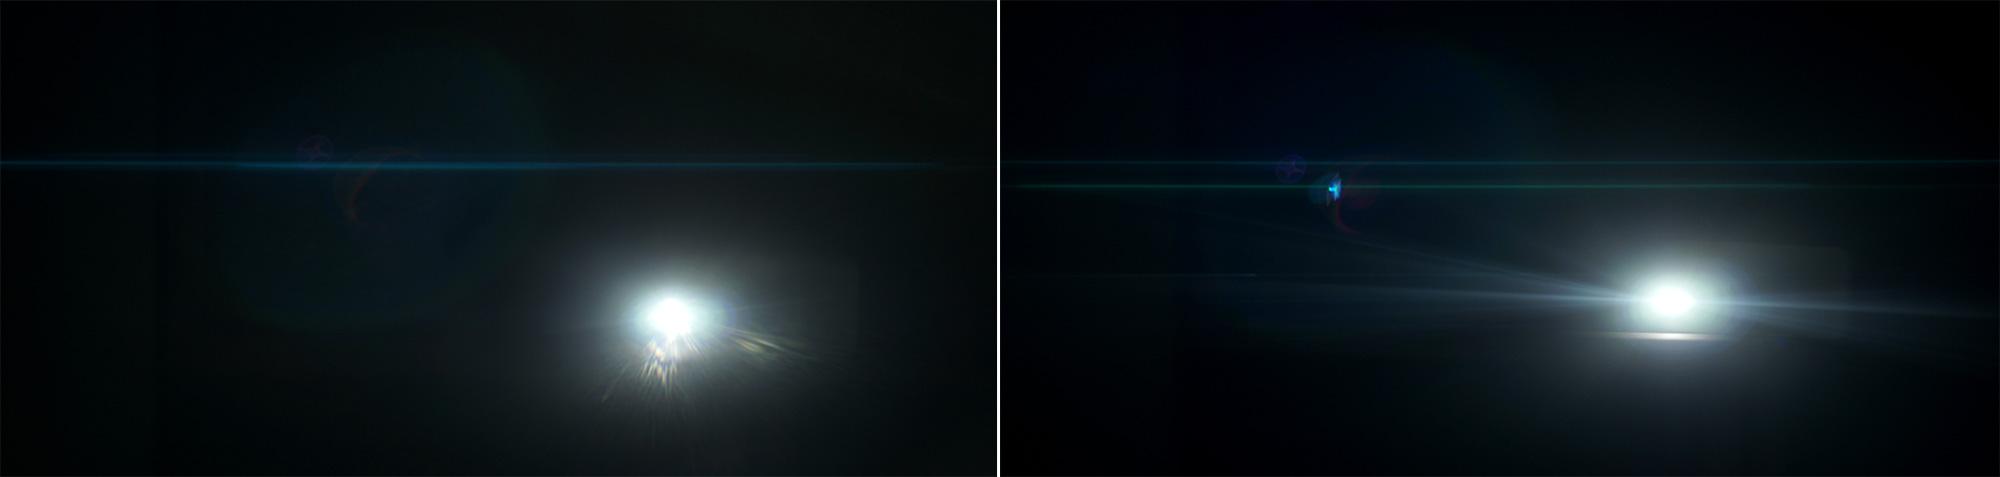 widescreen2000-flare